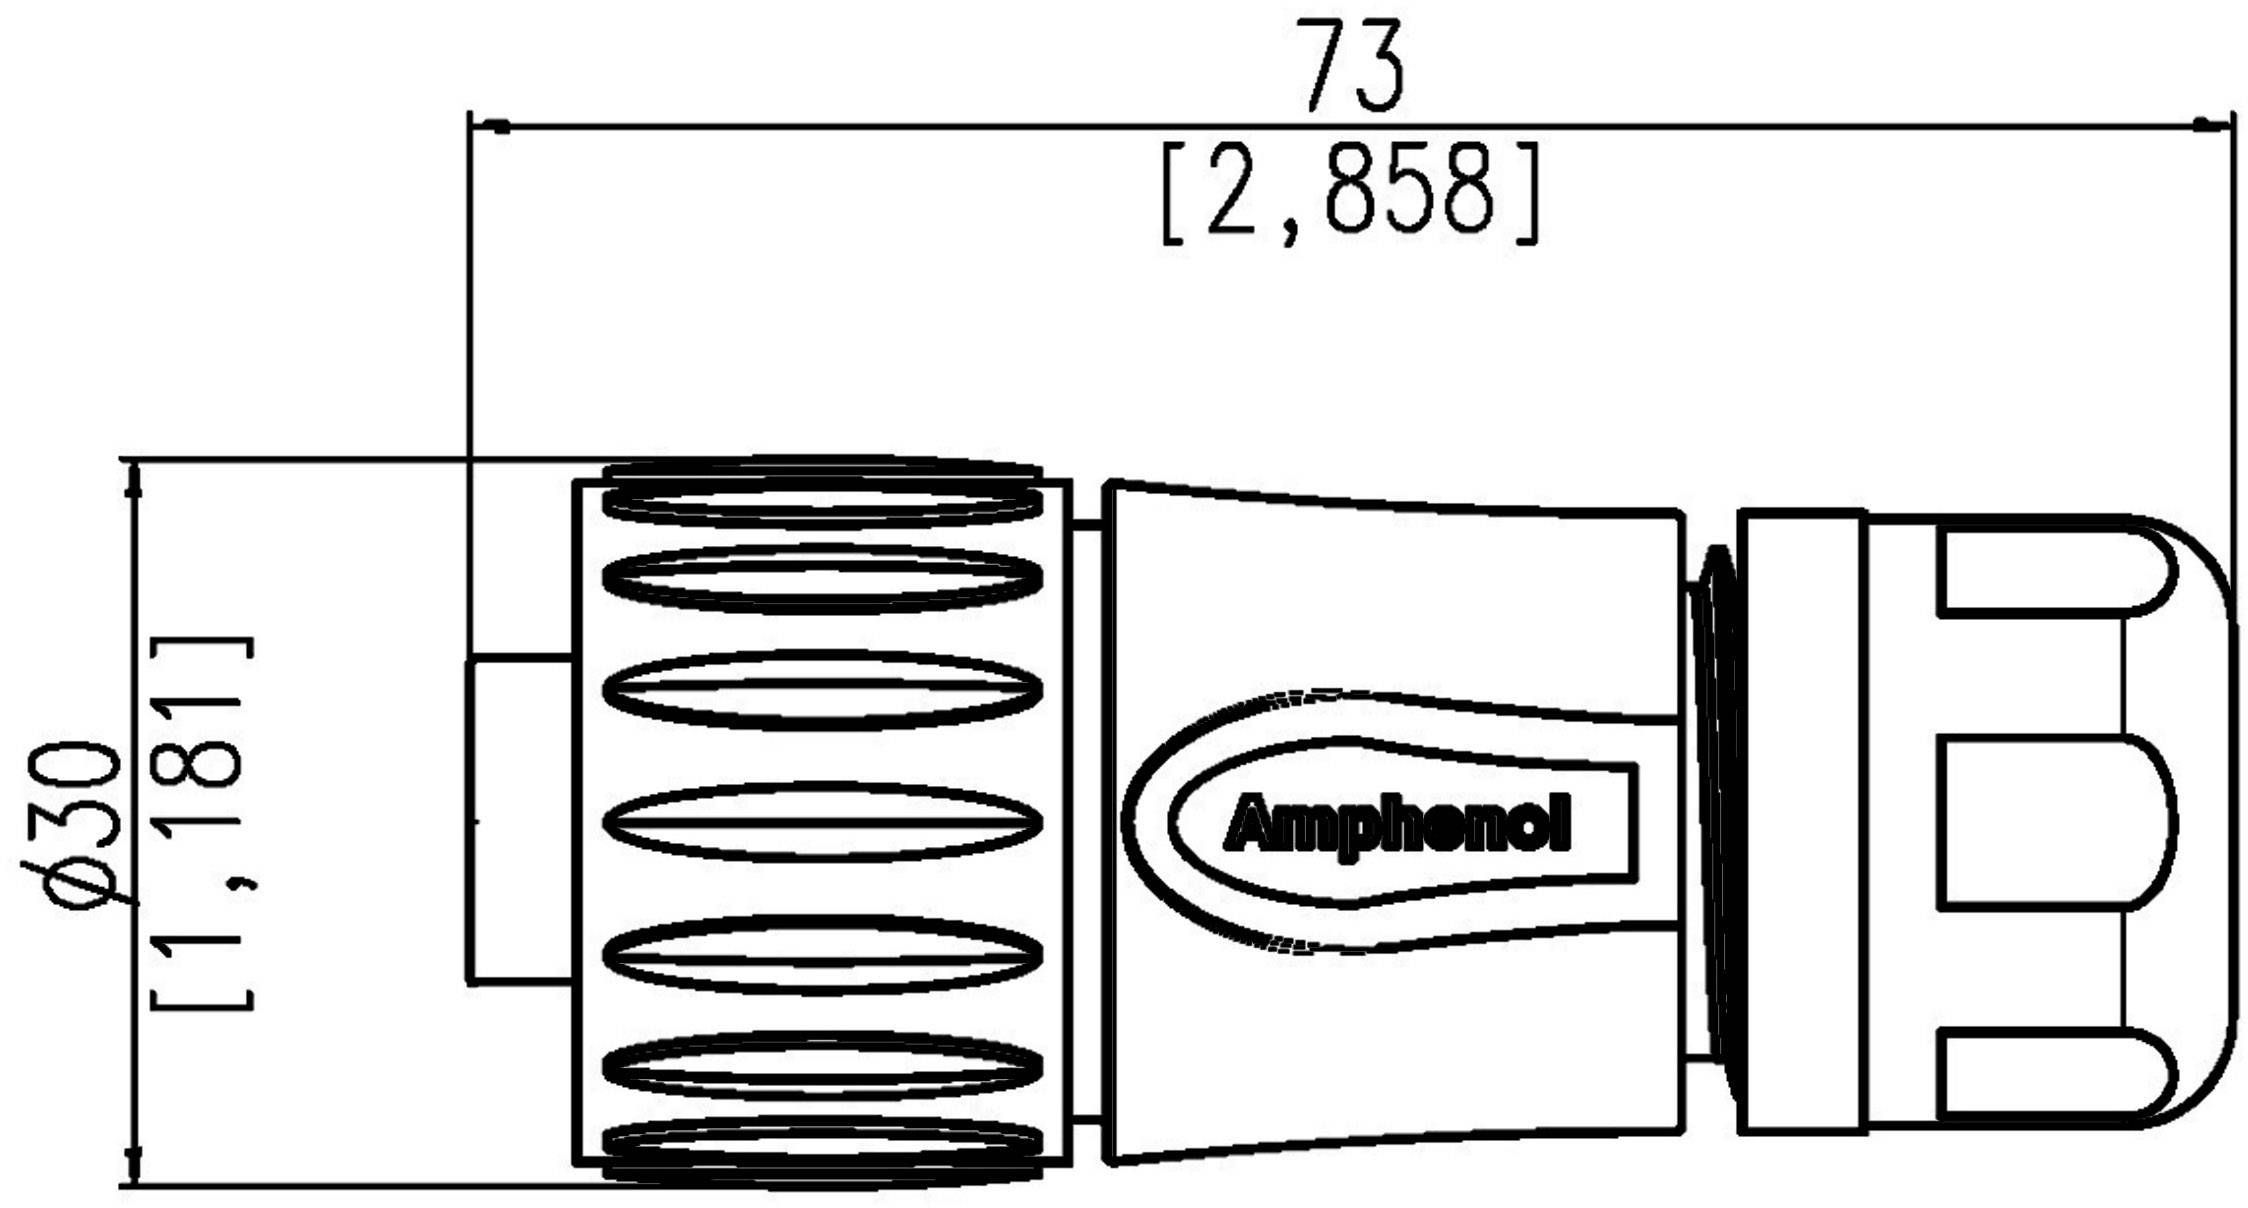 Amphenol C016 30h006 110 10 Straight Cable Plug C16 1